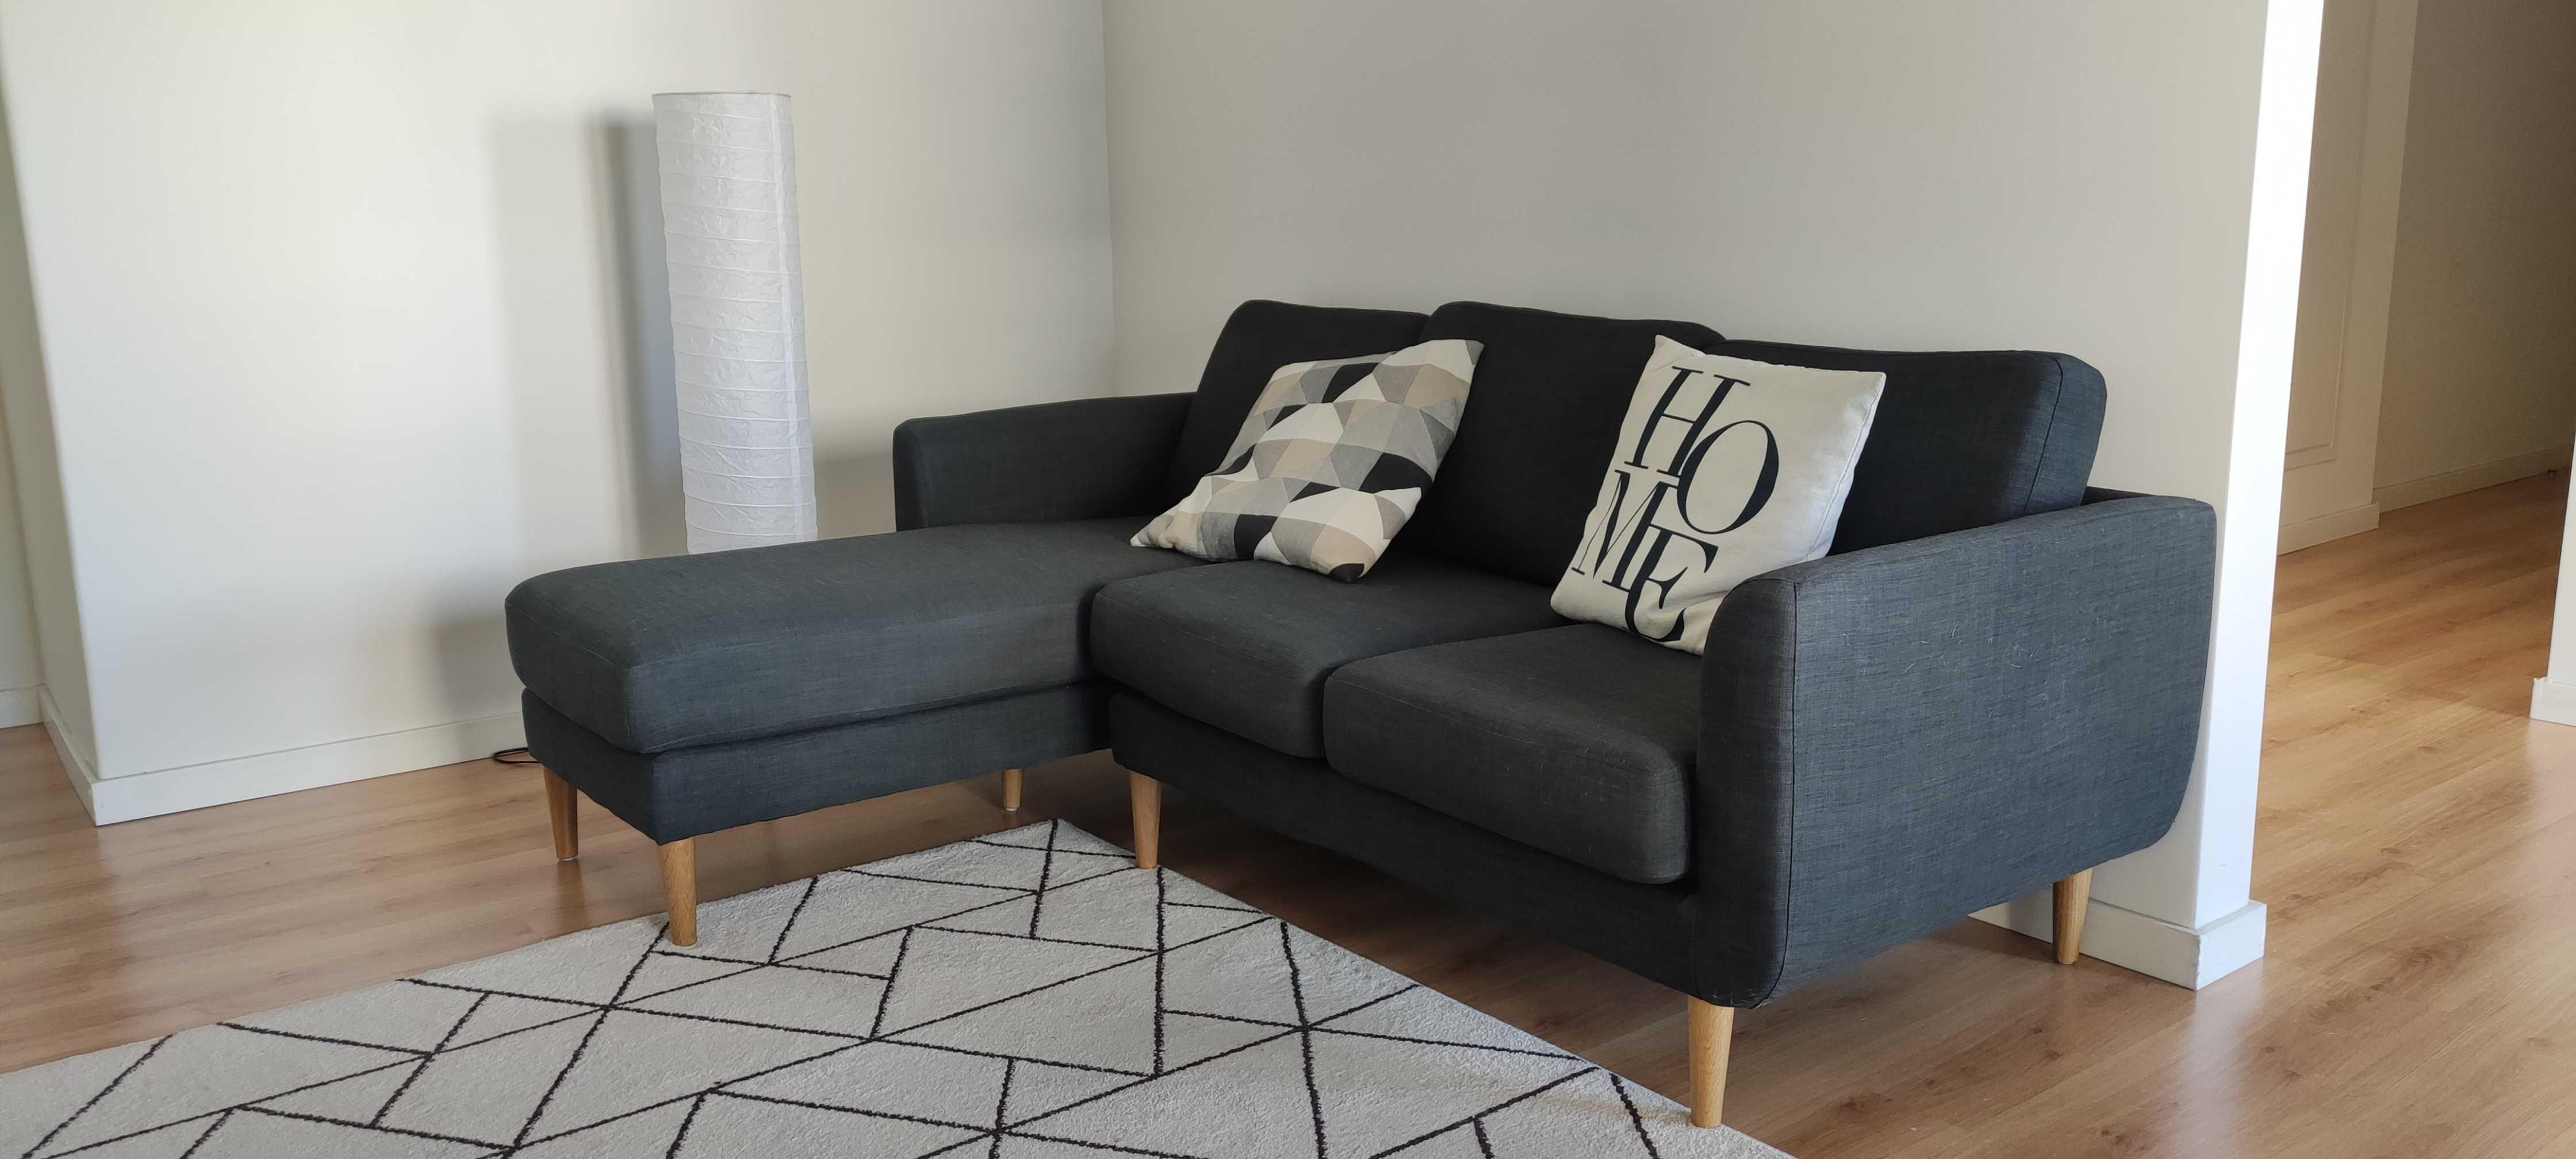 Sofá de canto com chaise longue JIMI - La Redoute